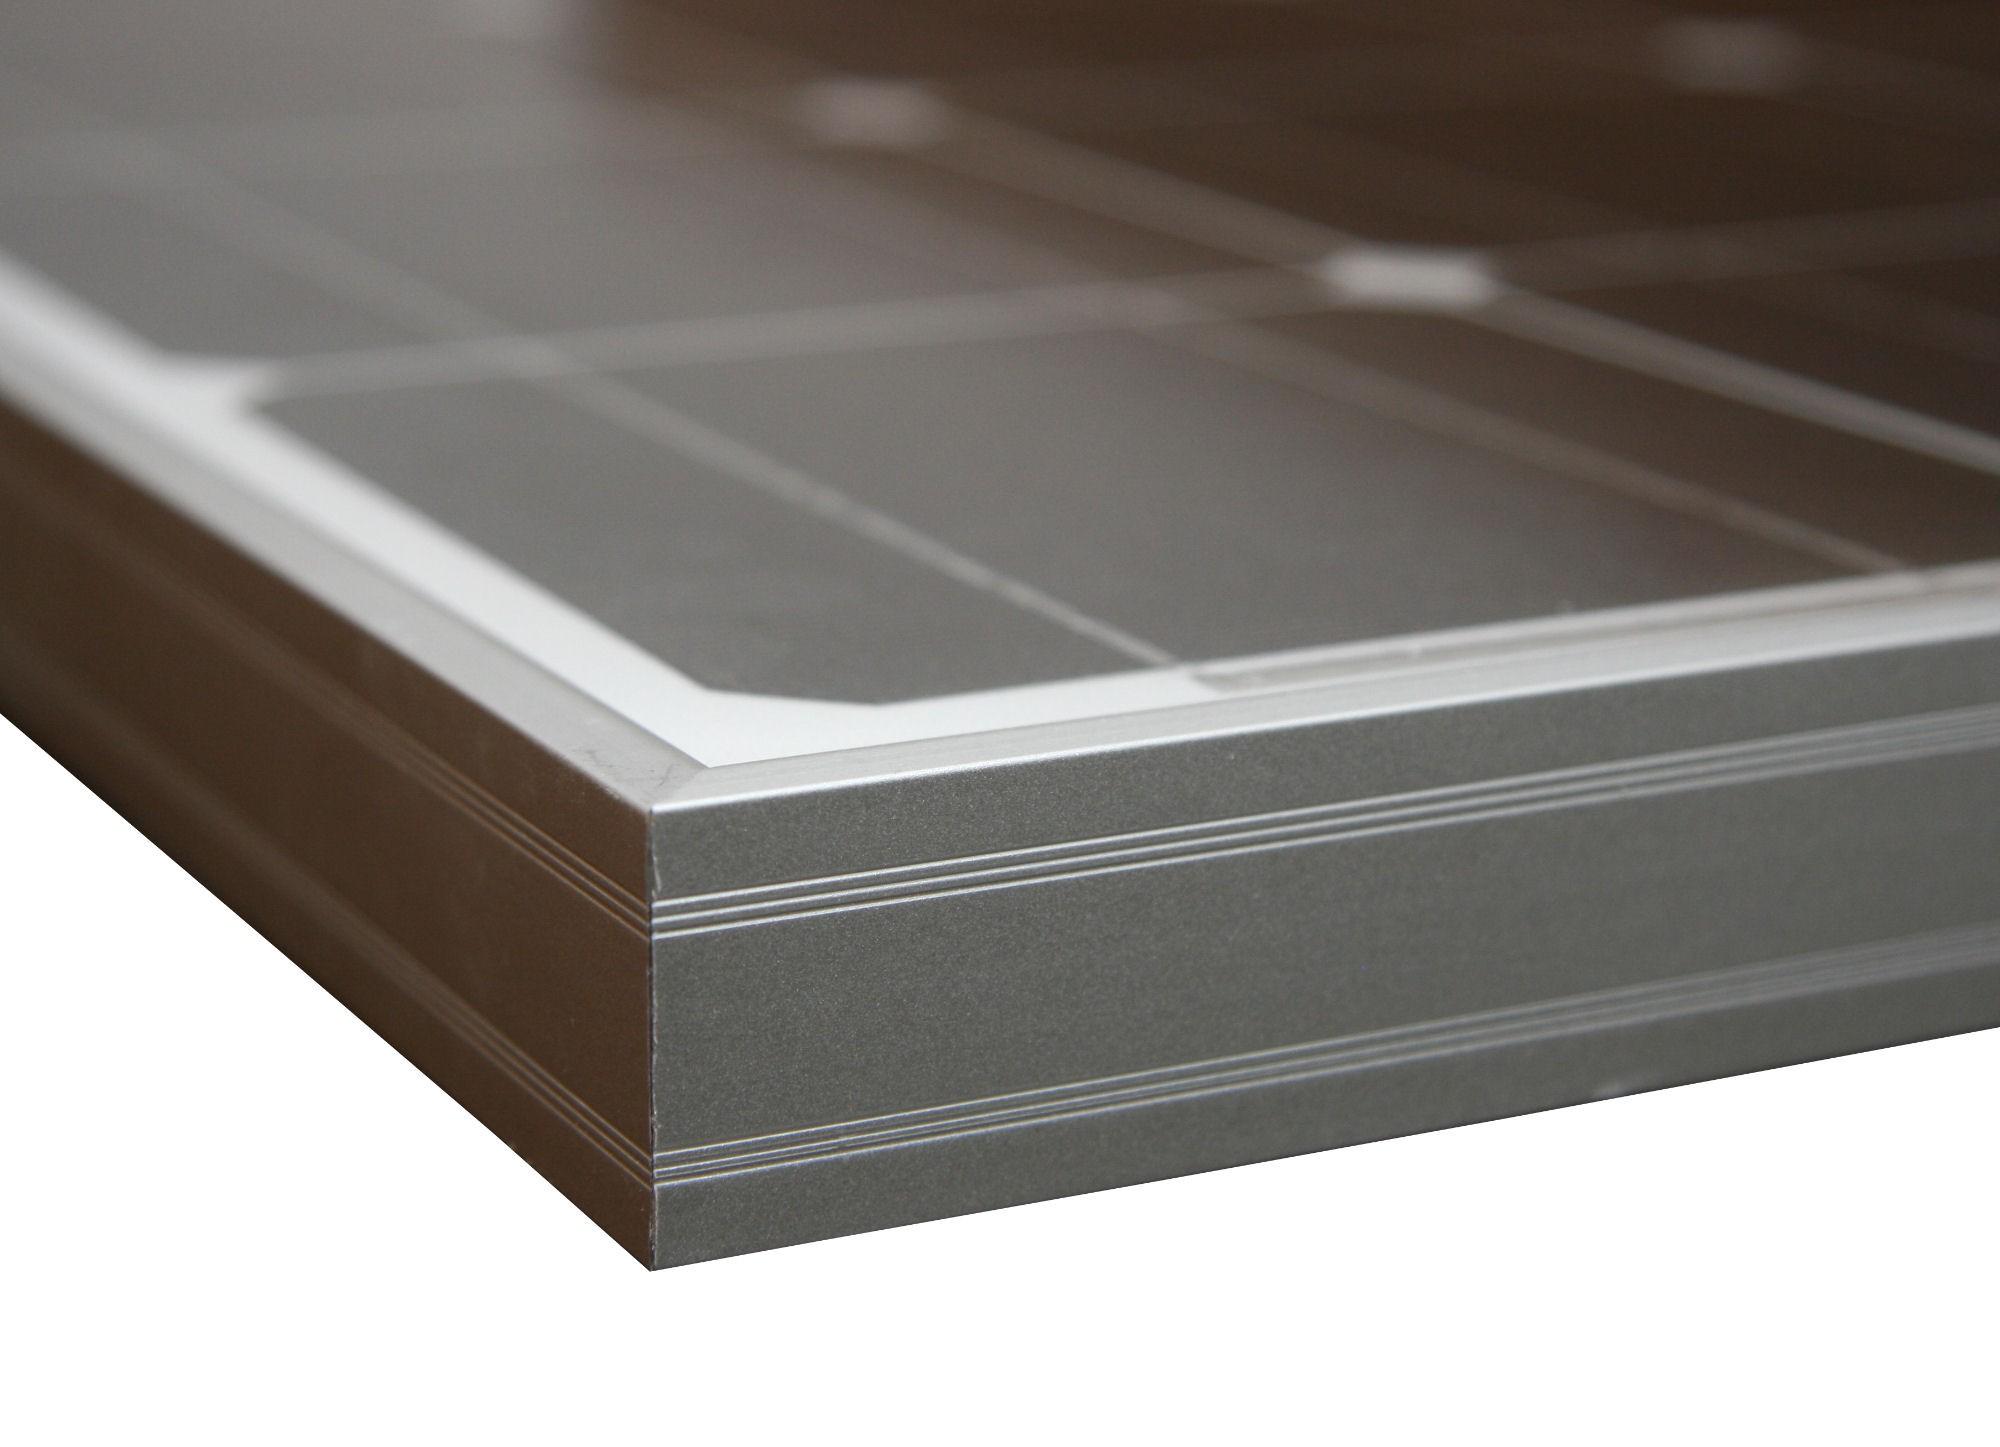 solarpanel solarmodul 12 v 160watt 160 w solarzelle 12 volt solar monokristallin ebay. Black Bedroom Furniture Sets. Home Design Ideas